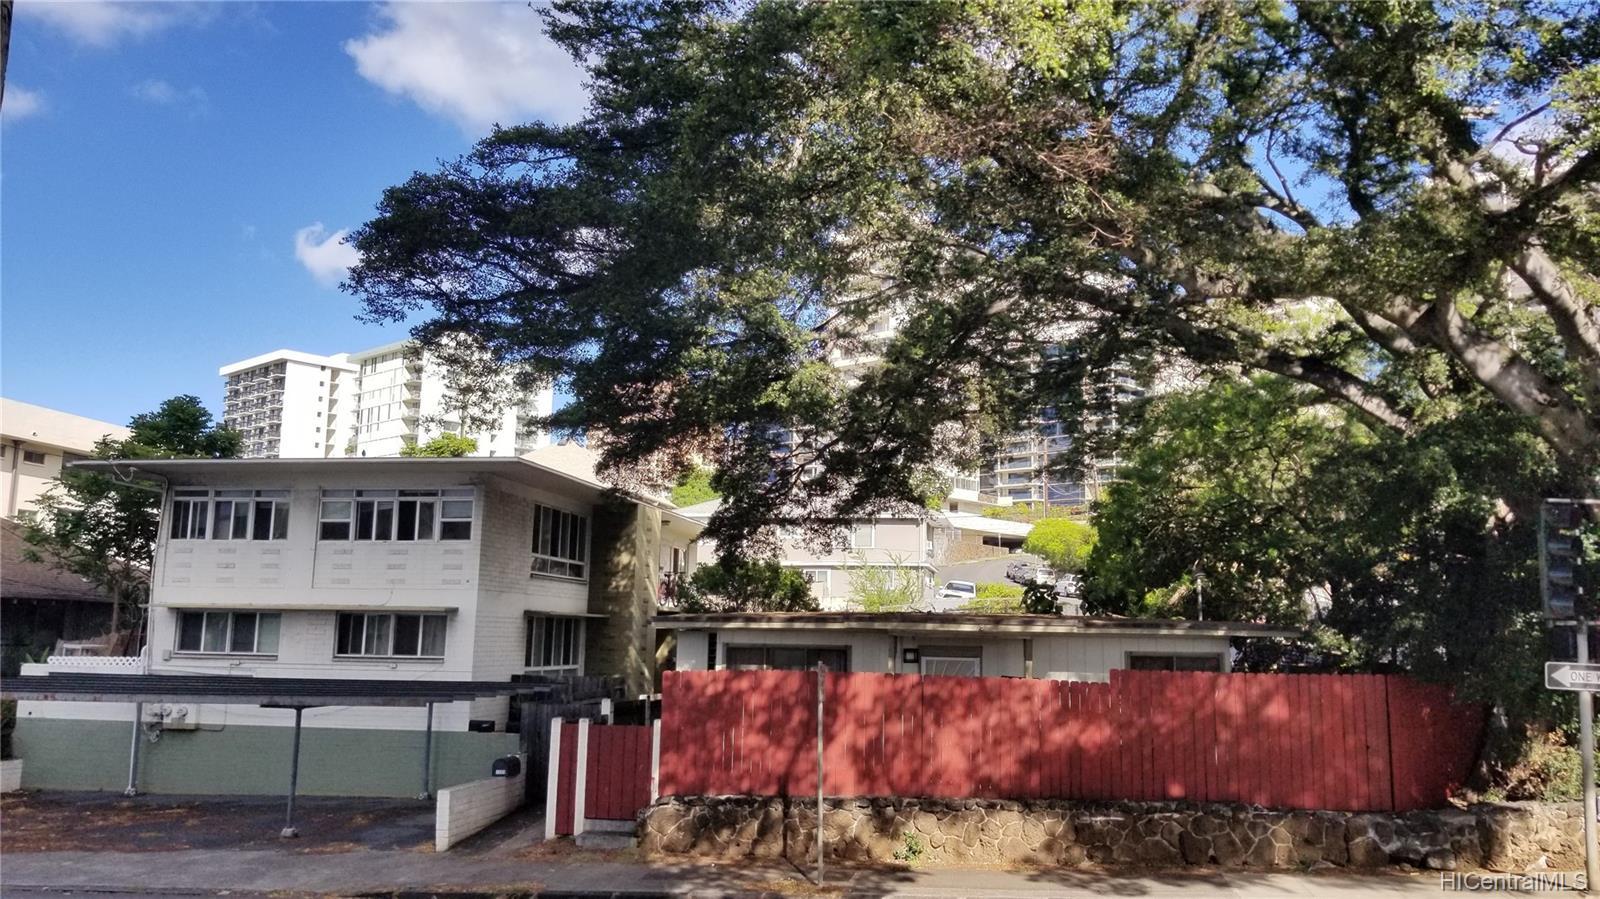 1576 Pensacola Street Honolulu - Multi-family - photo 2 of 20